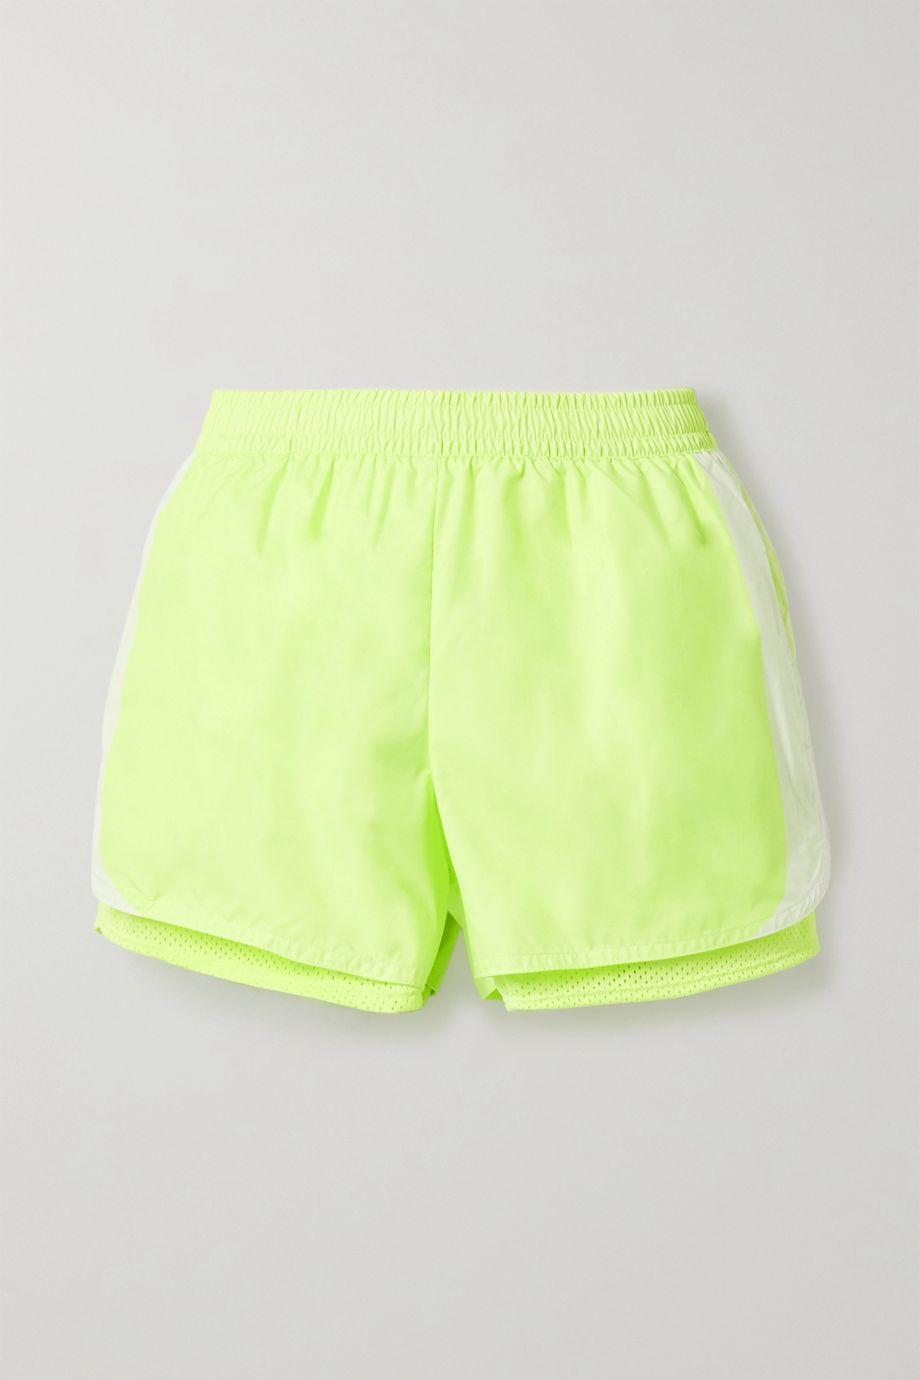 adidas by Stella McCartney M20 neon layered shell and mesh shorts